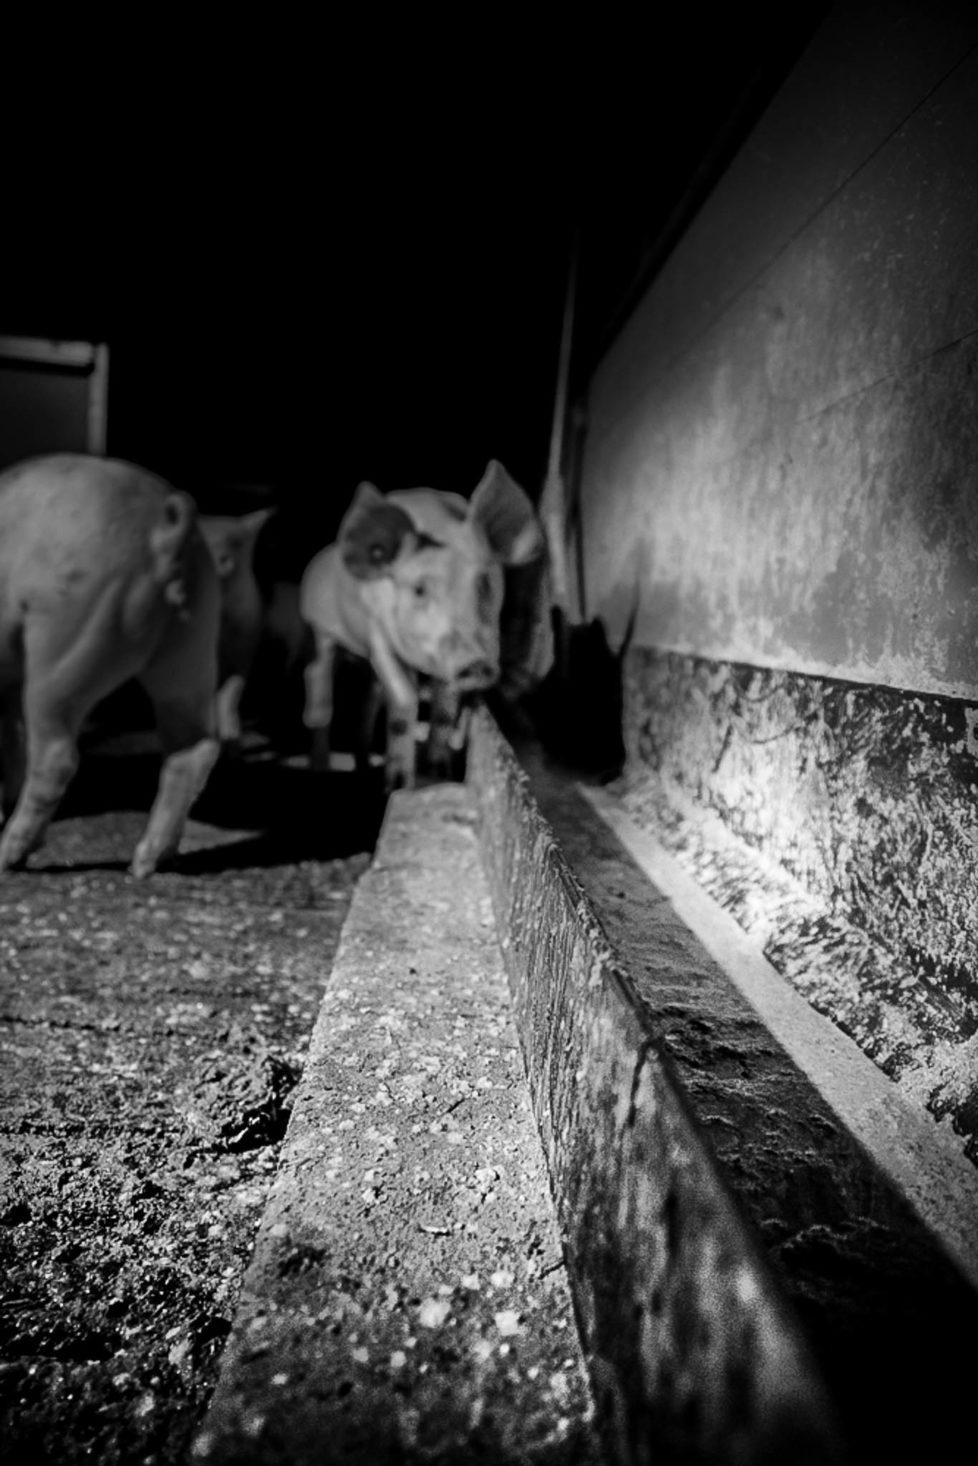 pigs-20131205-2